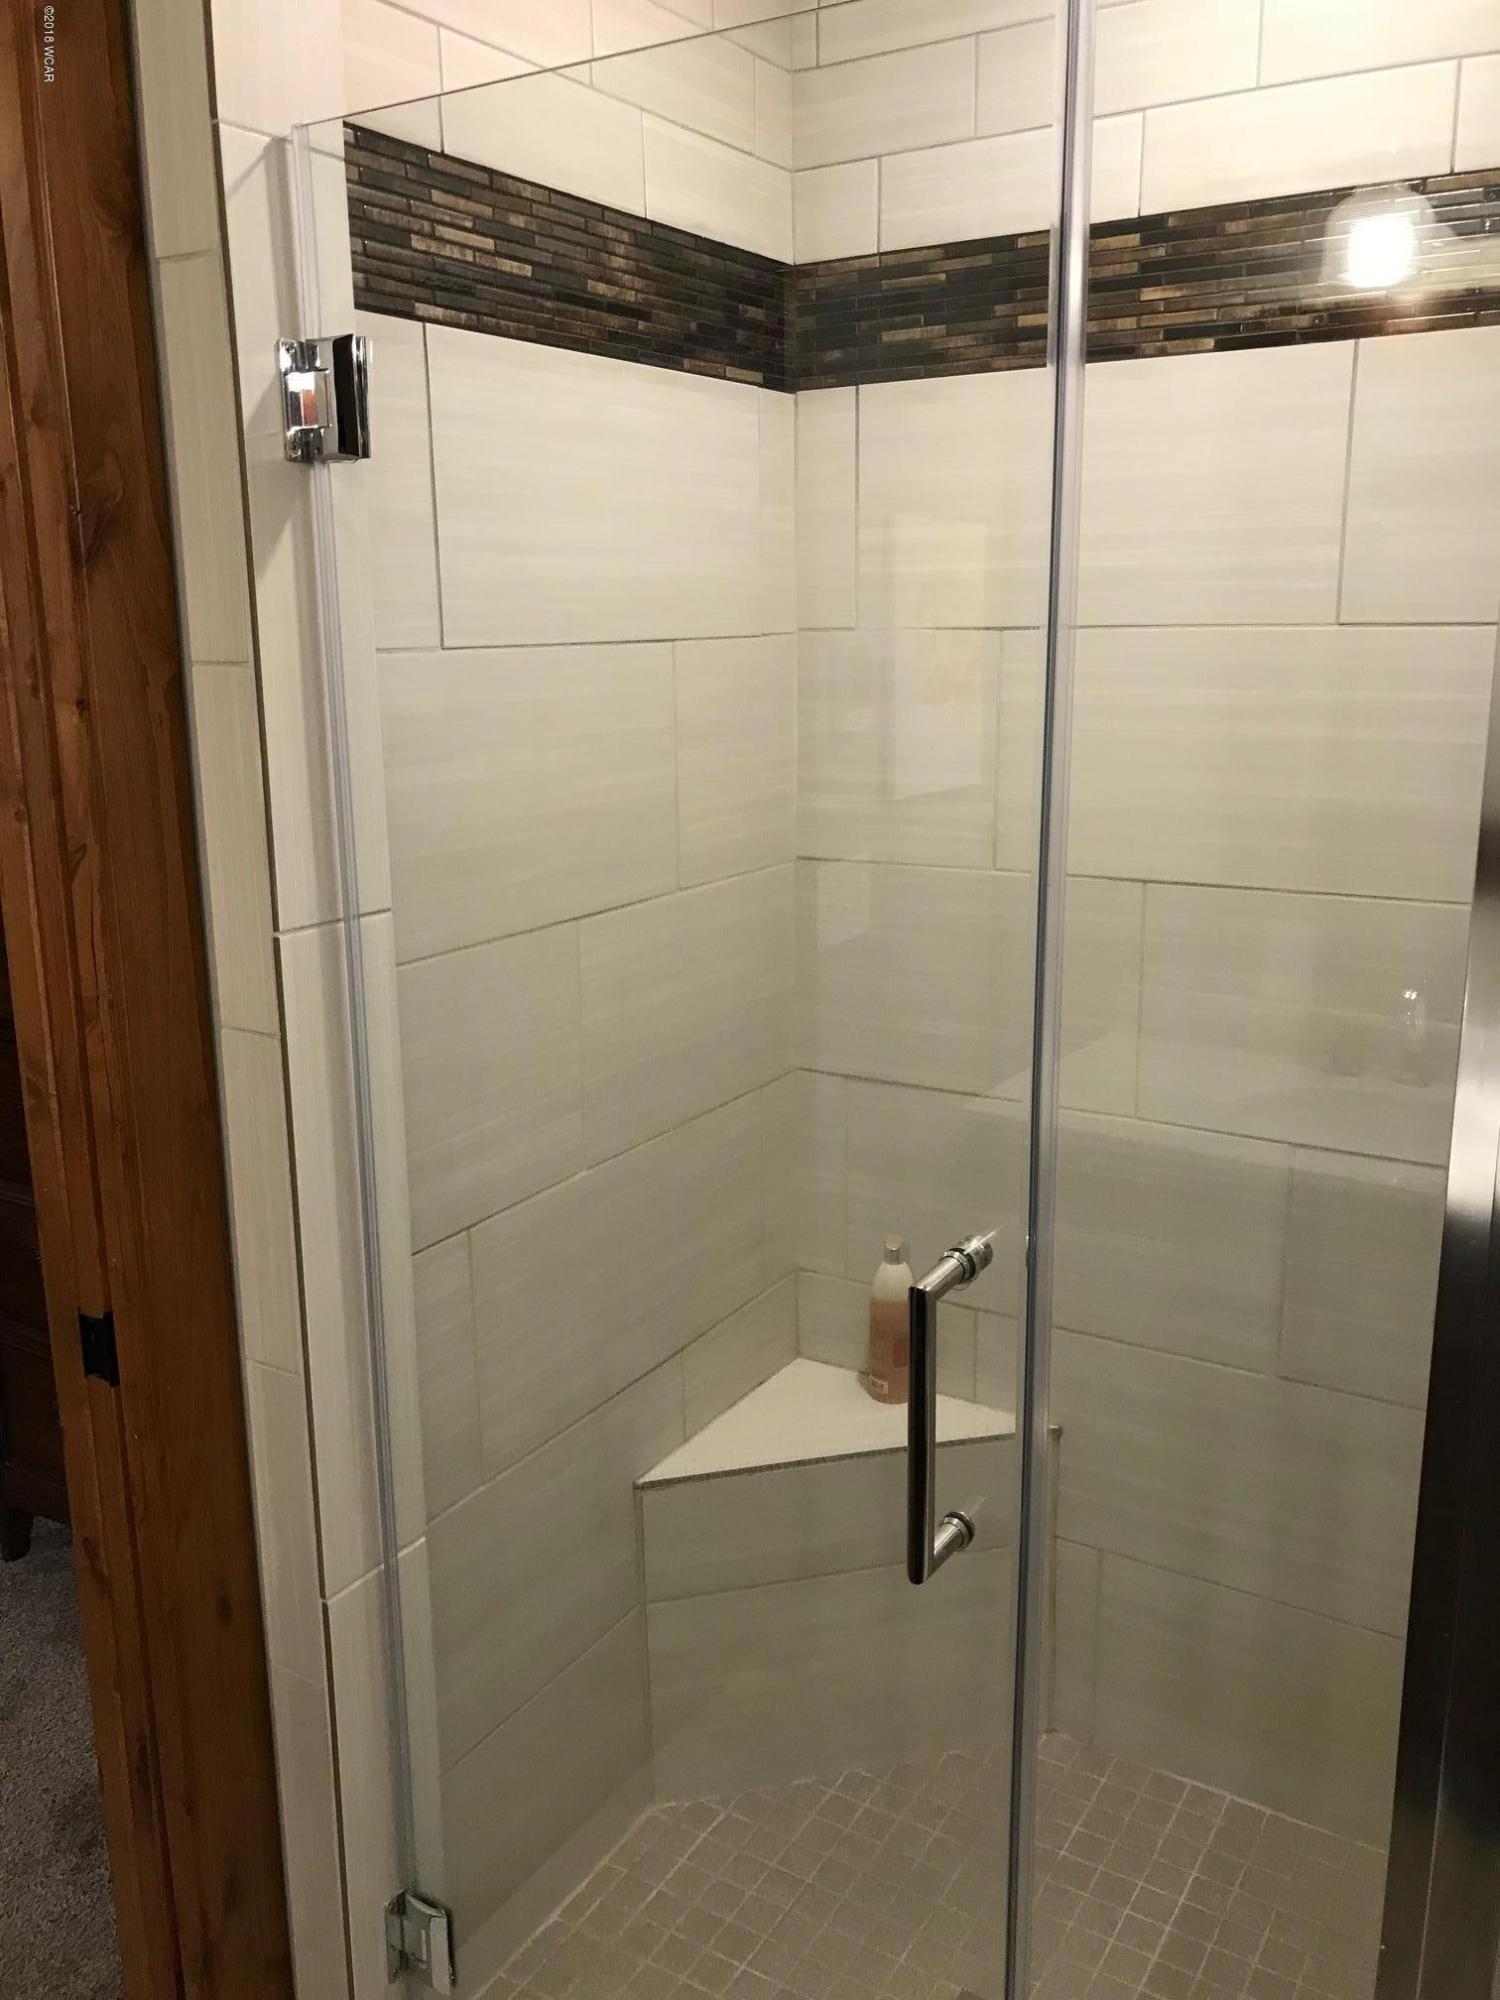 19345 Andrew Road,New London,5 Bedrooms Bedrooms,4 BathroomsBathrooms,Single Family,Andrew Road,6031342